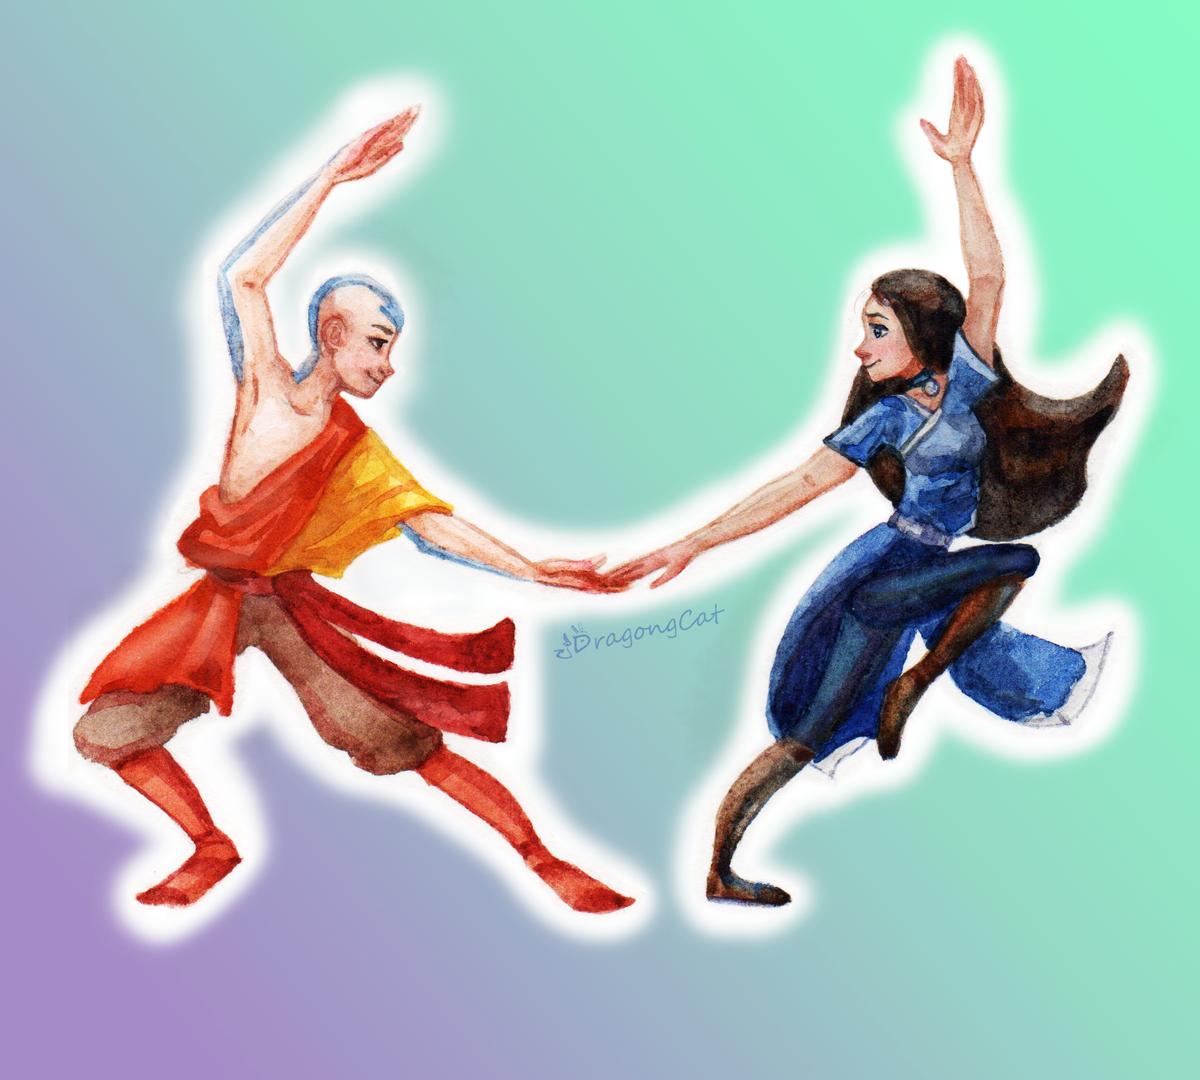 Hello! I like the avatar so here's Aang and Katara  #Avatar #atla #TheLastAirbender #watercolor #traditional #Fanart https://t.co/J2MvLaSyGd